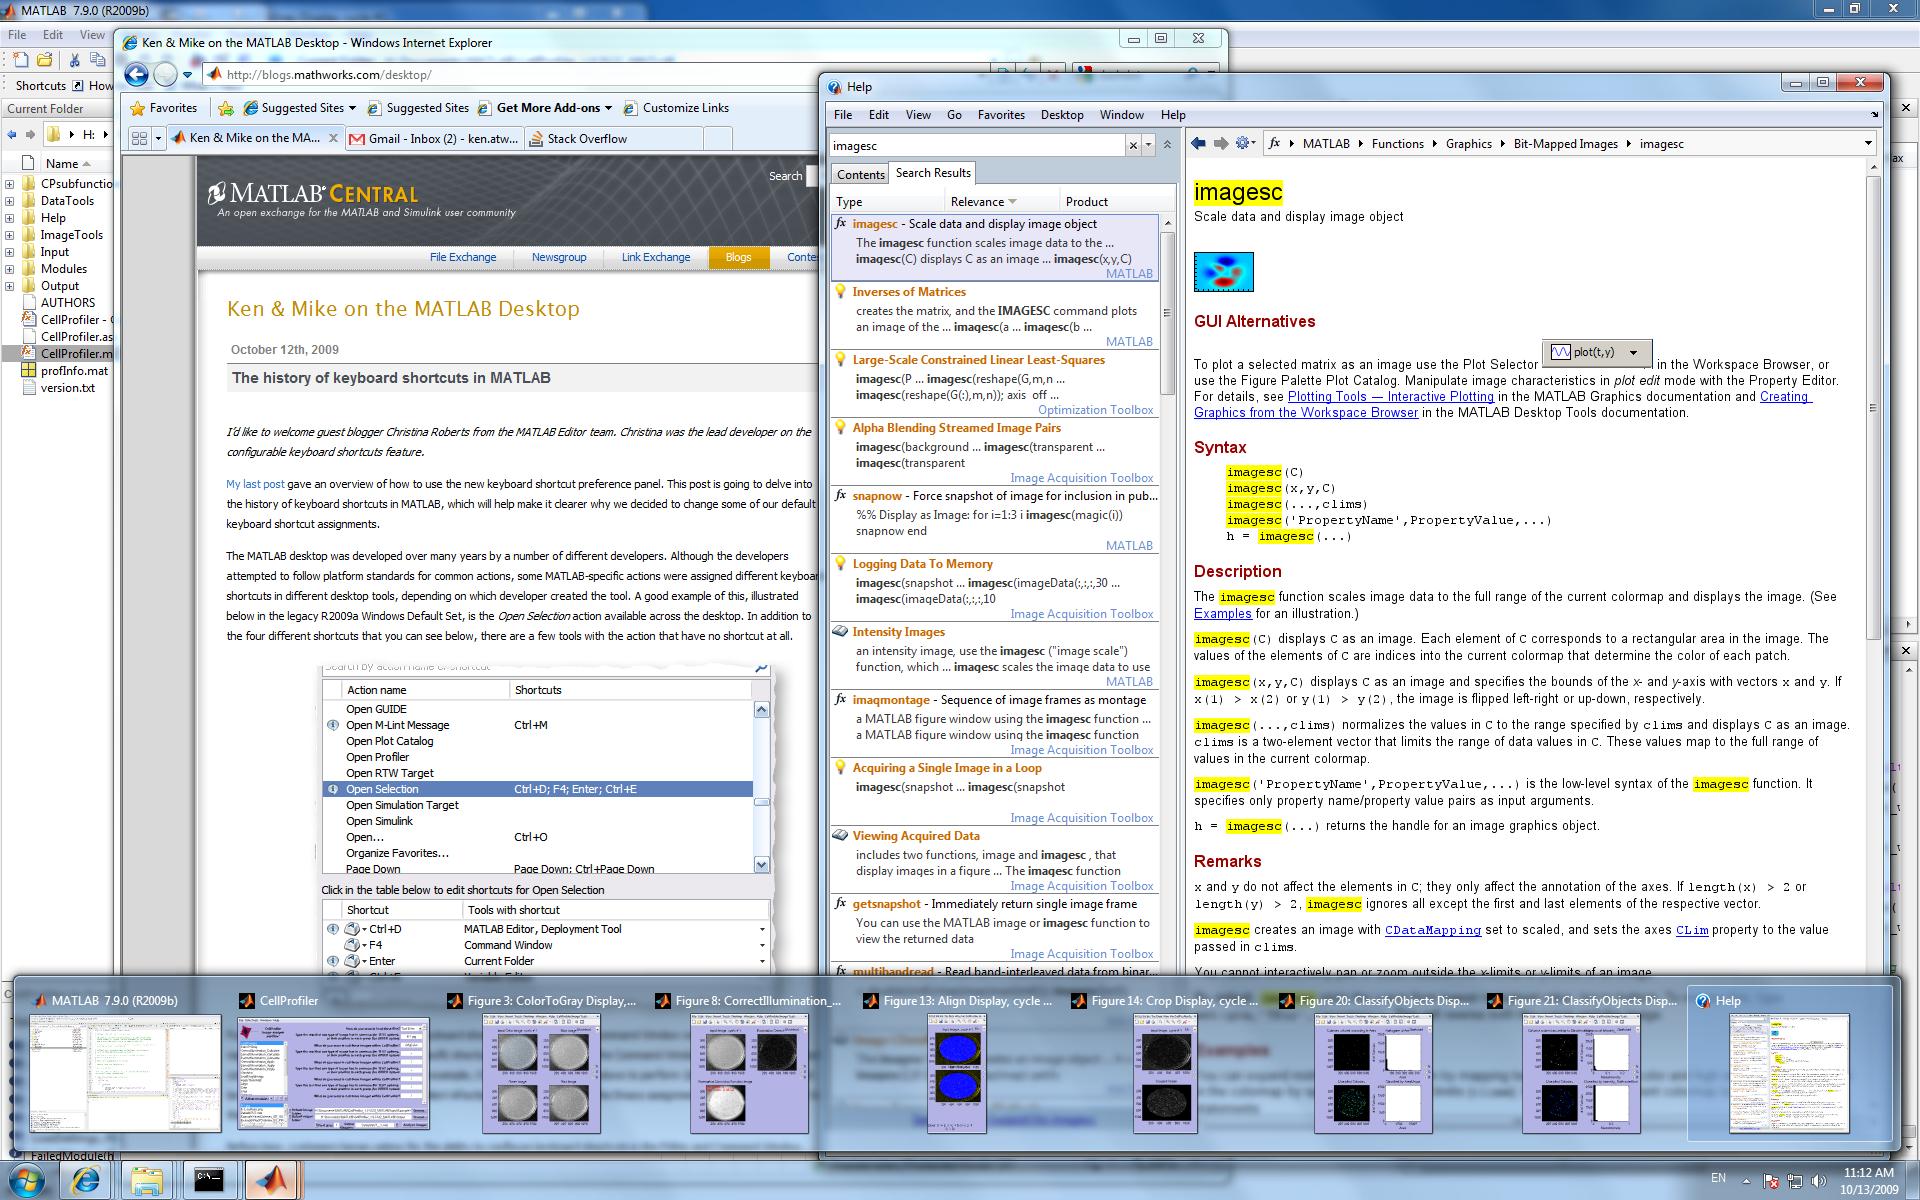 mATLAB EN Windows 7